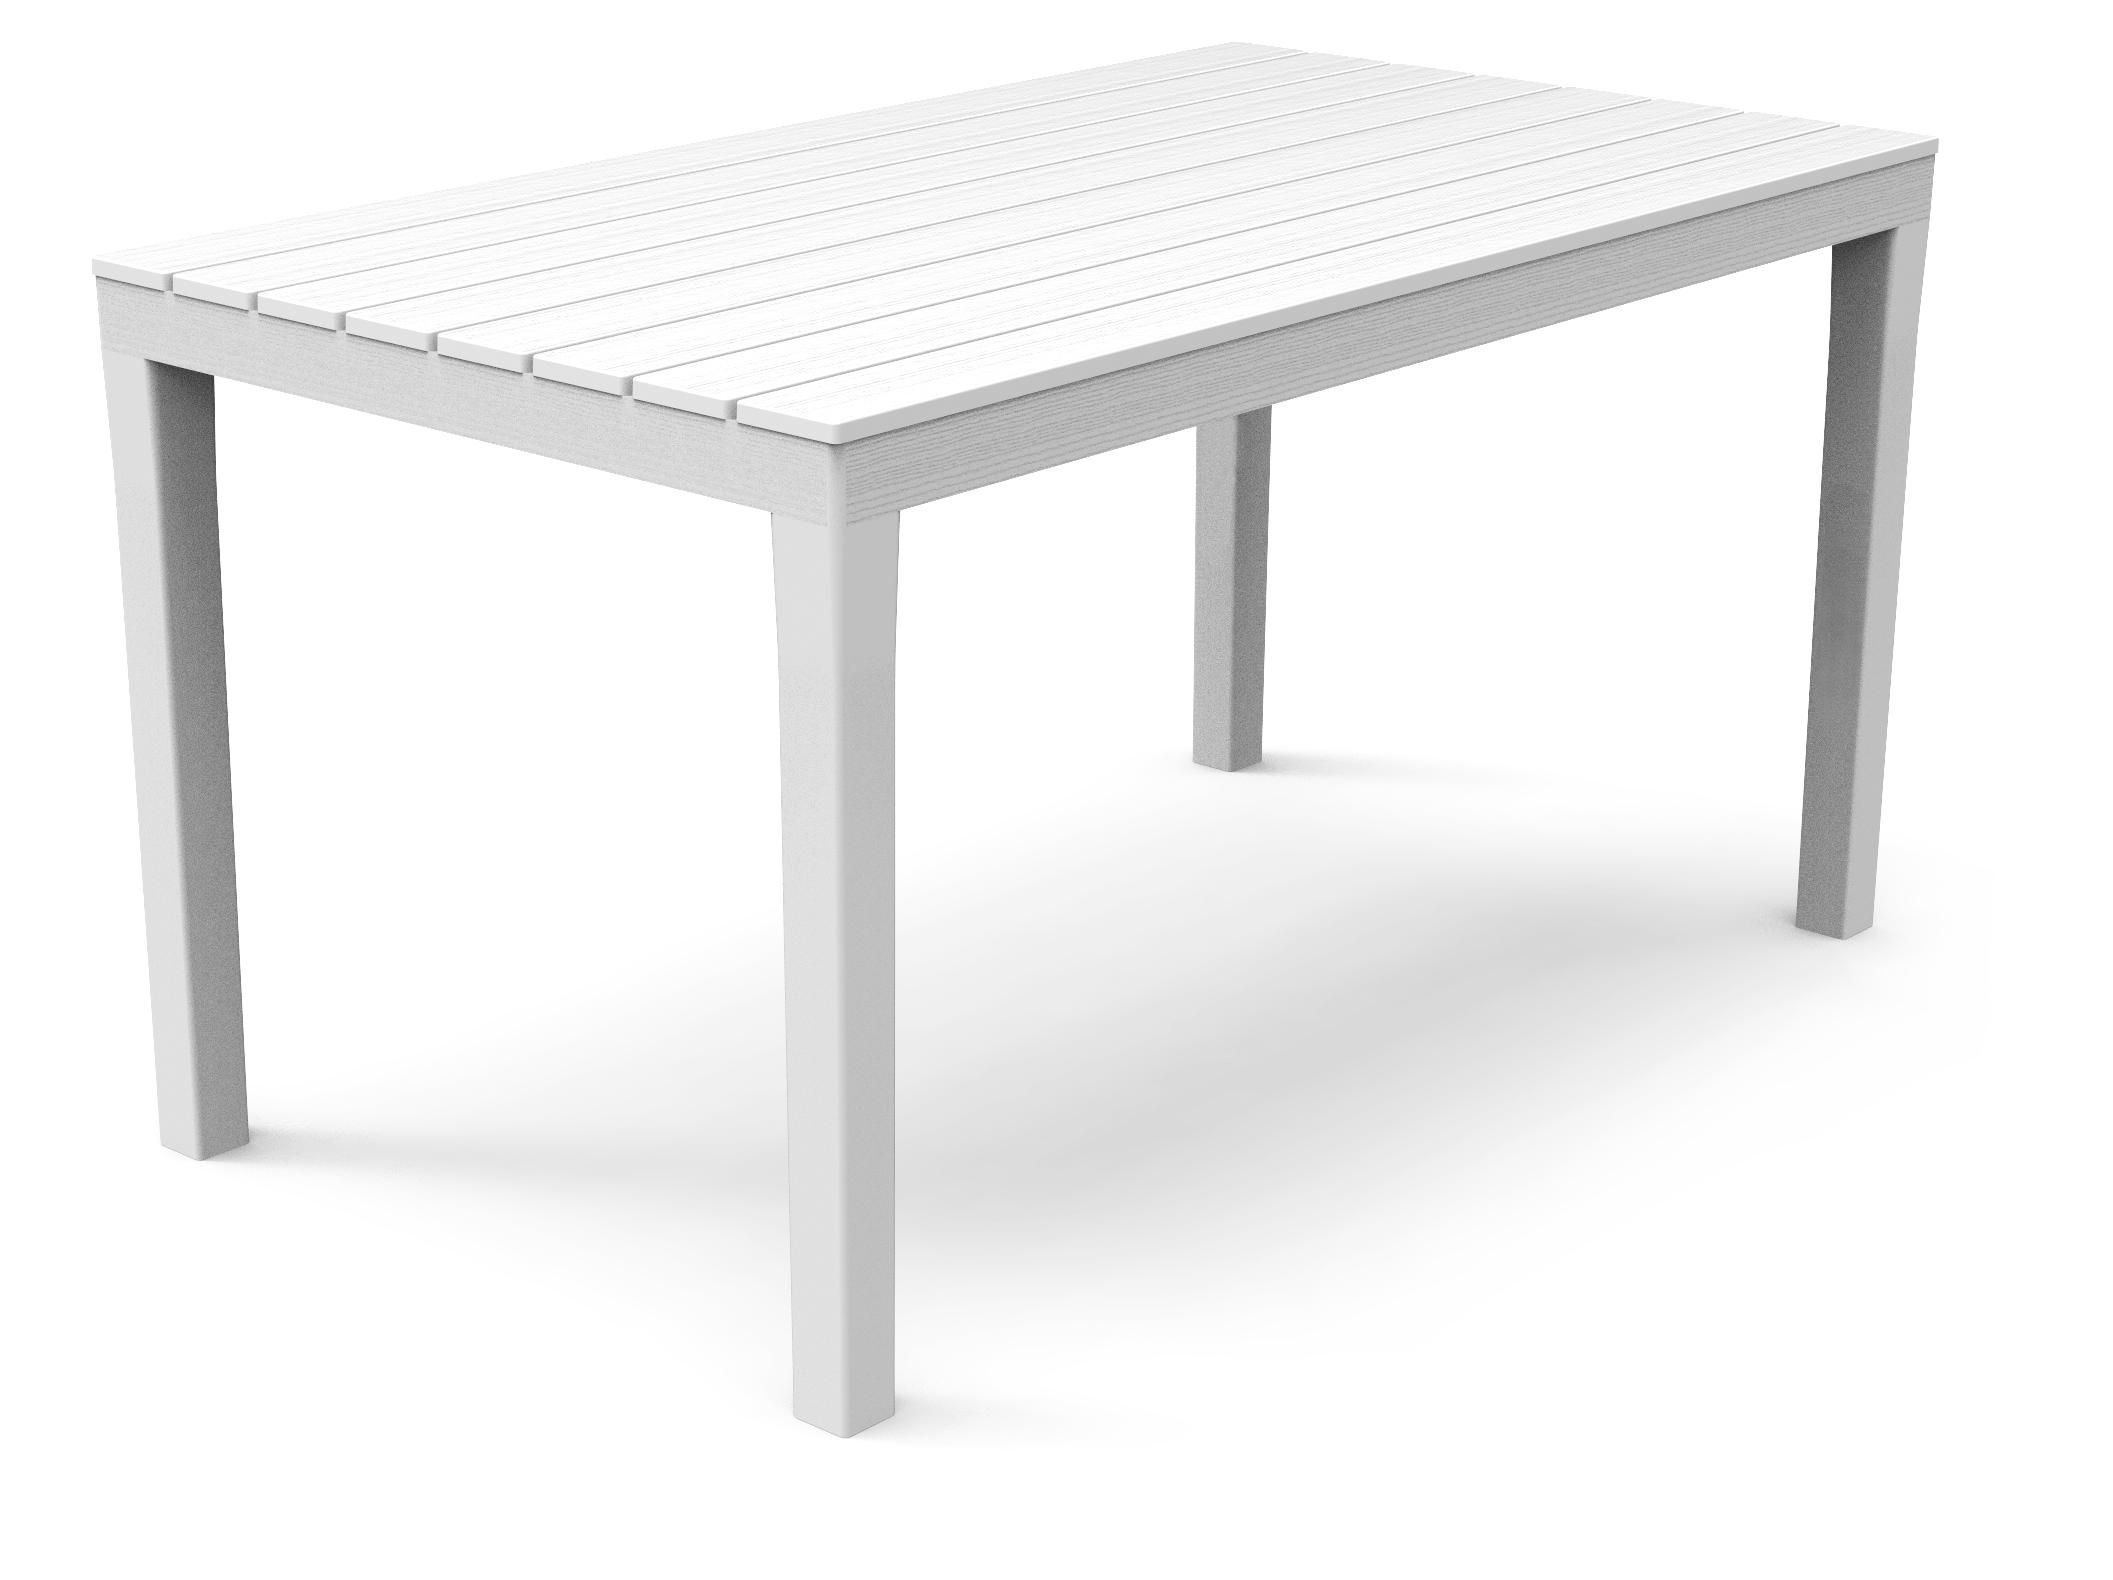 sumatra gartentisch 140x80cm kunststoff in holz optik wei. Black Bedroom Furniture Sets. Home Design Ideas